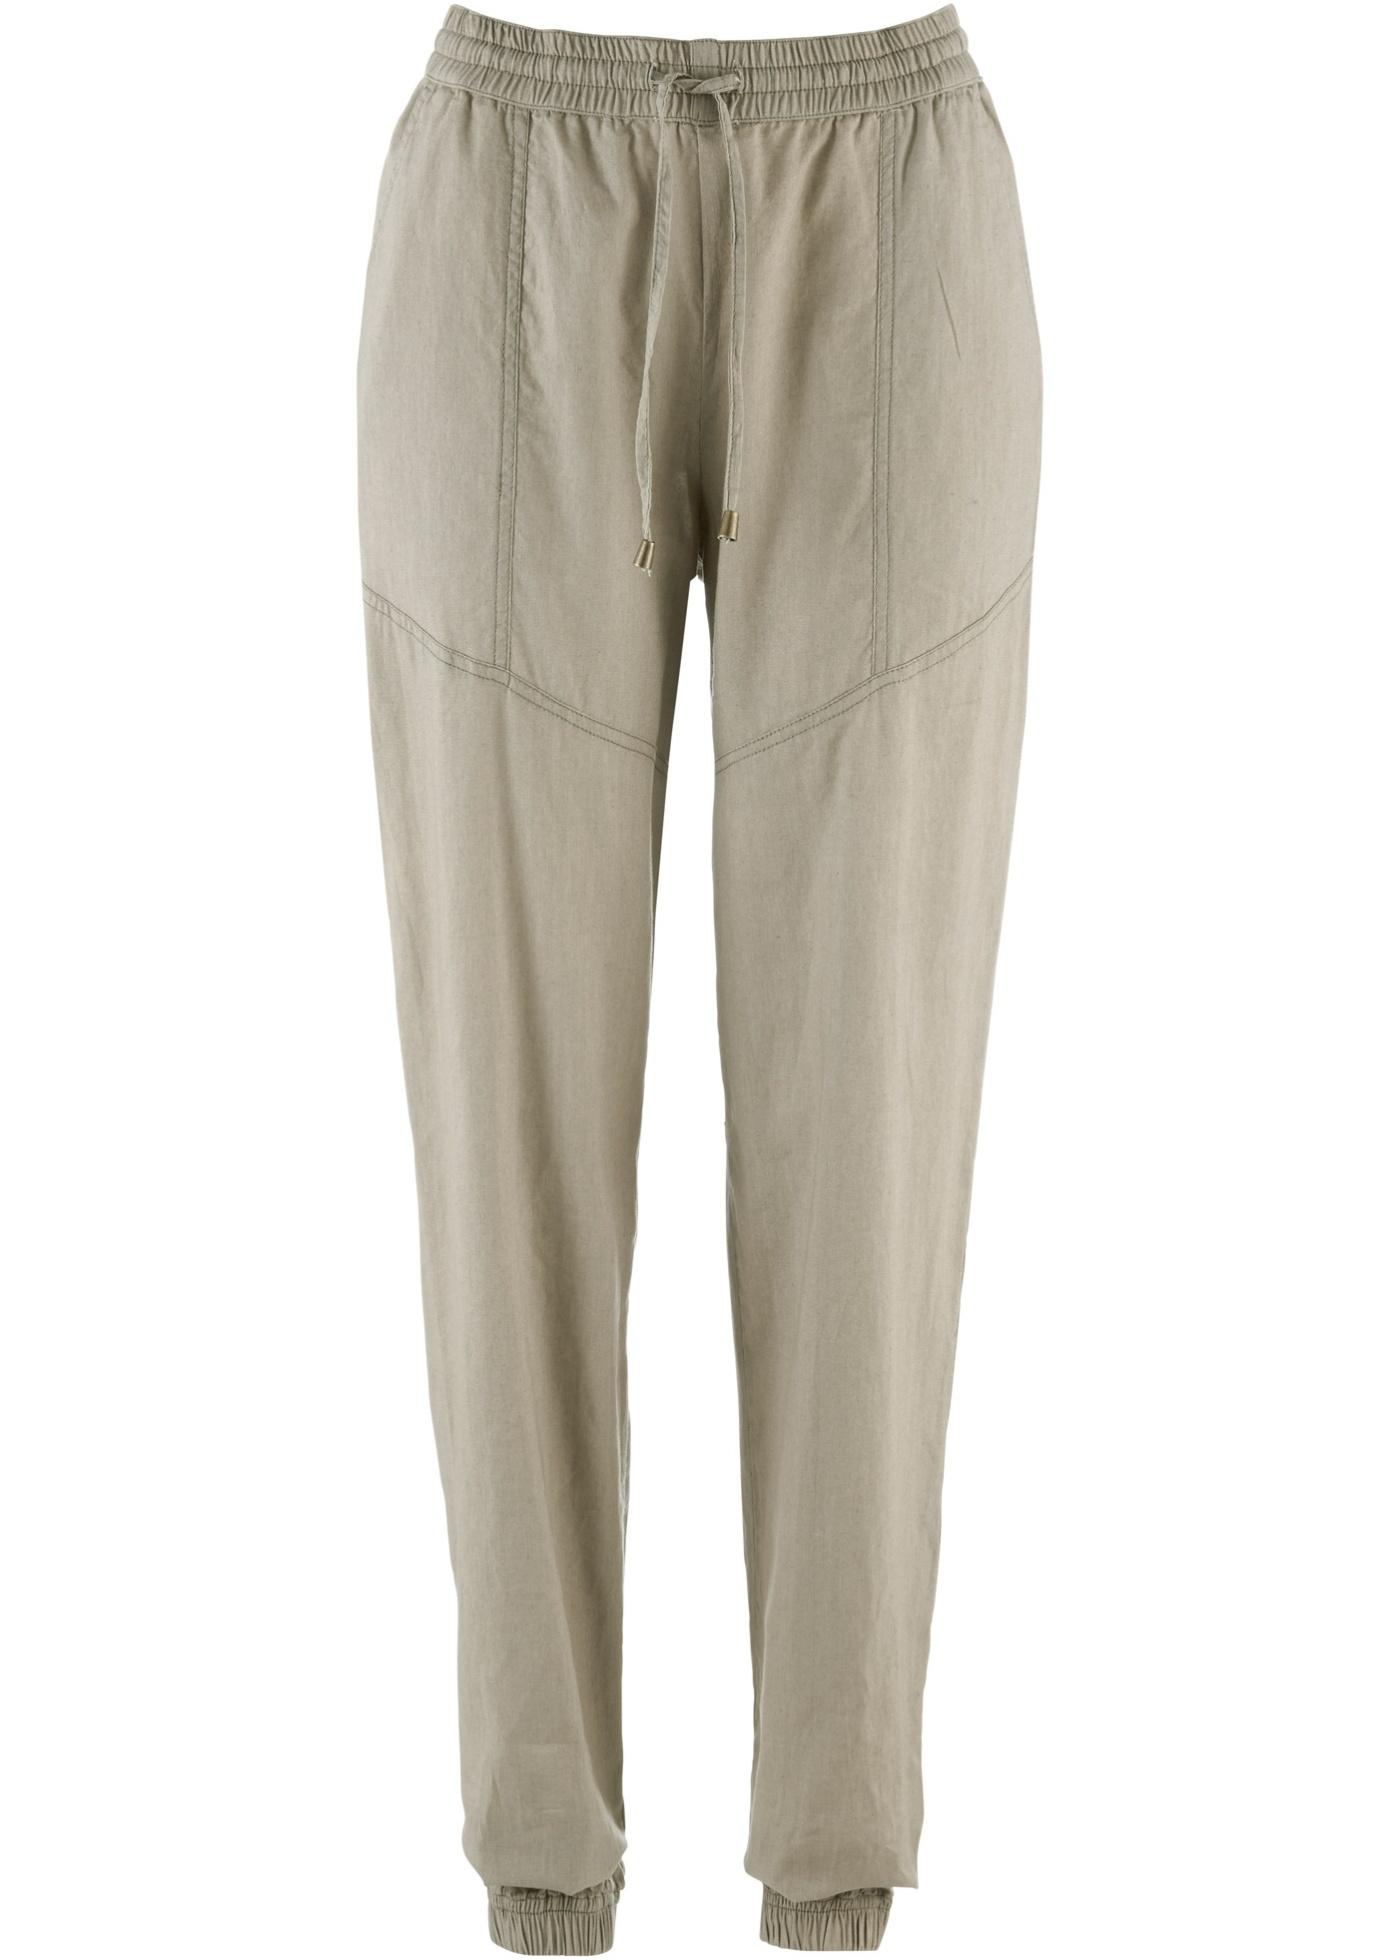 Pantalon sarouel en lin gris femme - bonprix